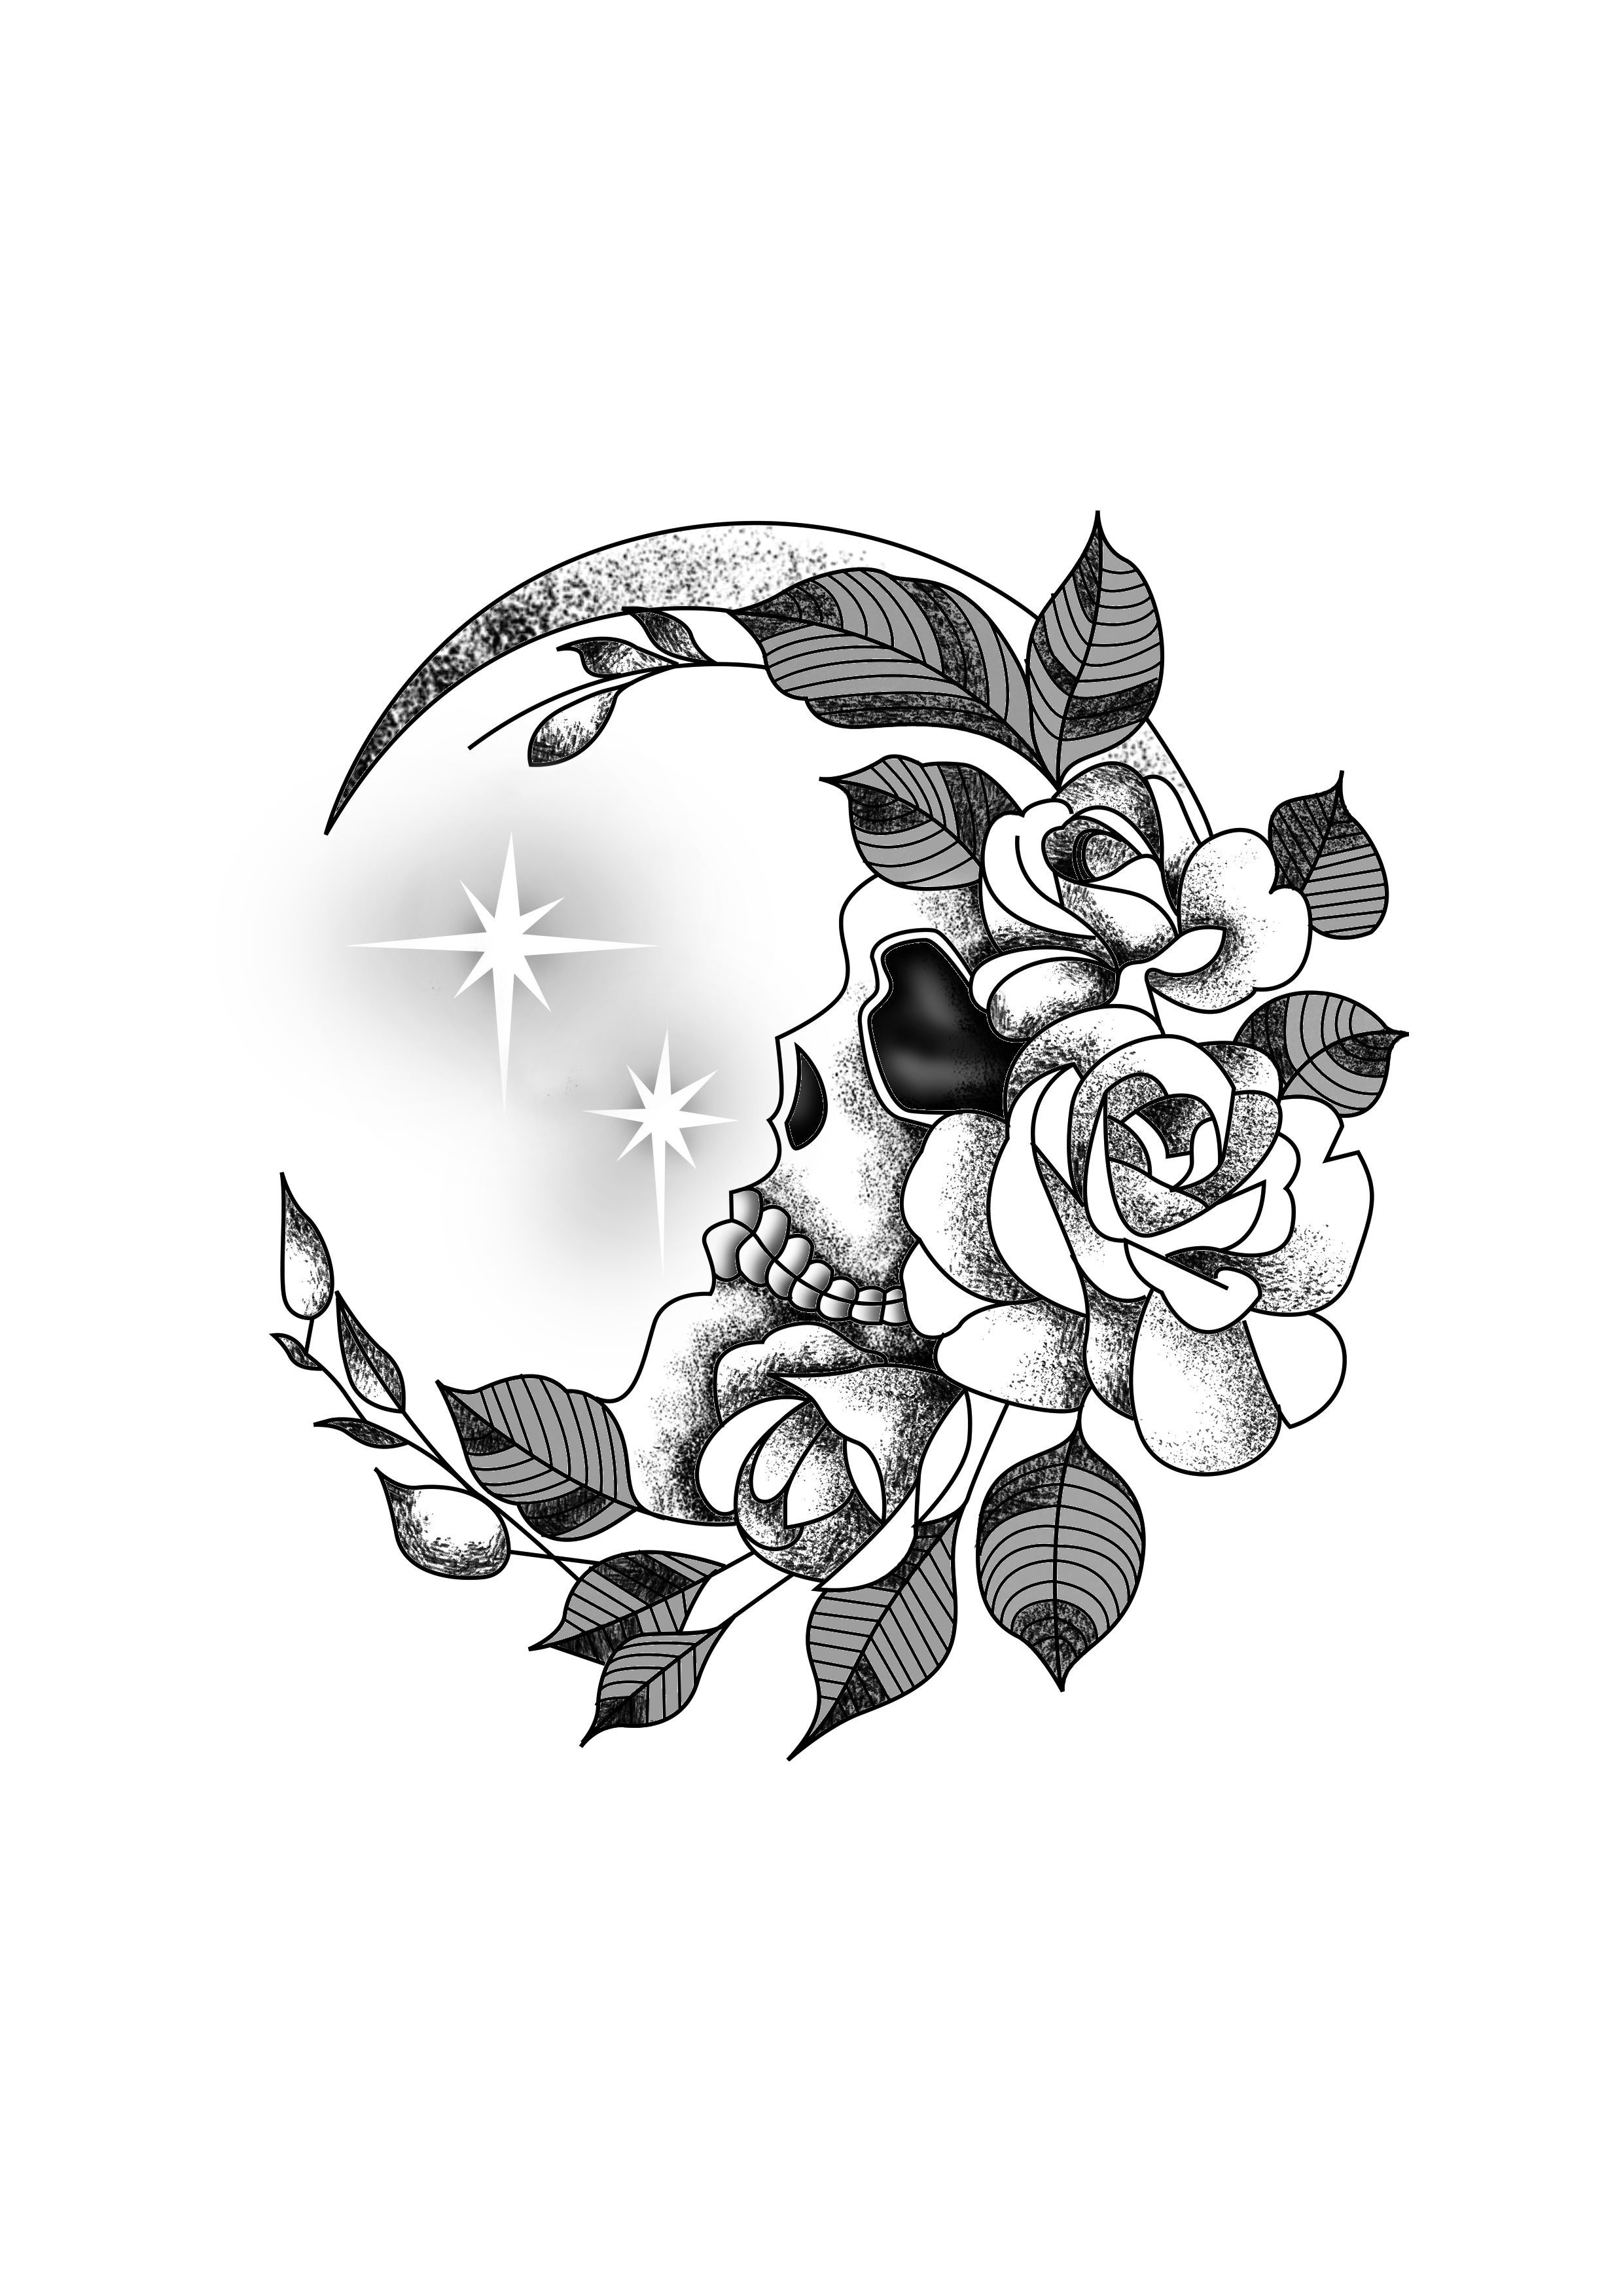 Flower Crescent Moon Skull Wrist Tattoo Design Black White Designer Andrija Protic In 2020 Skull Wrist Skull Tattoo Design Skull Tattoos